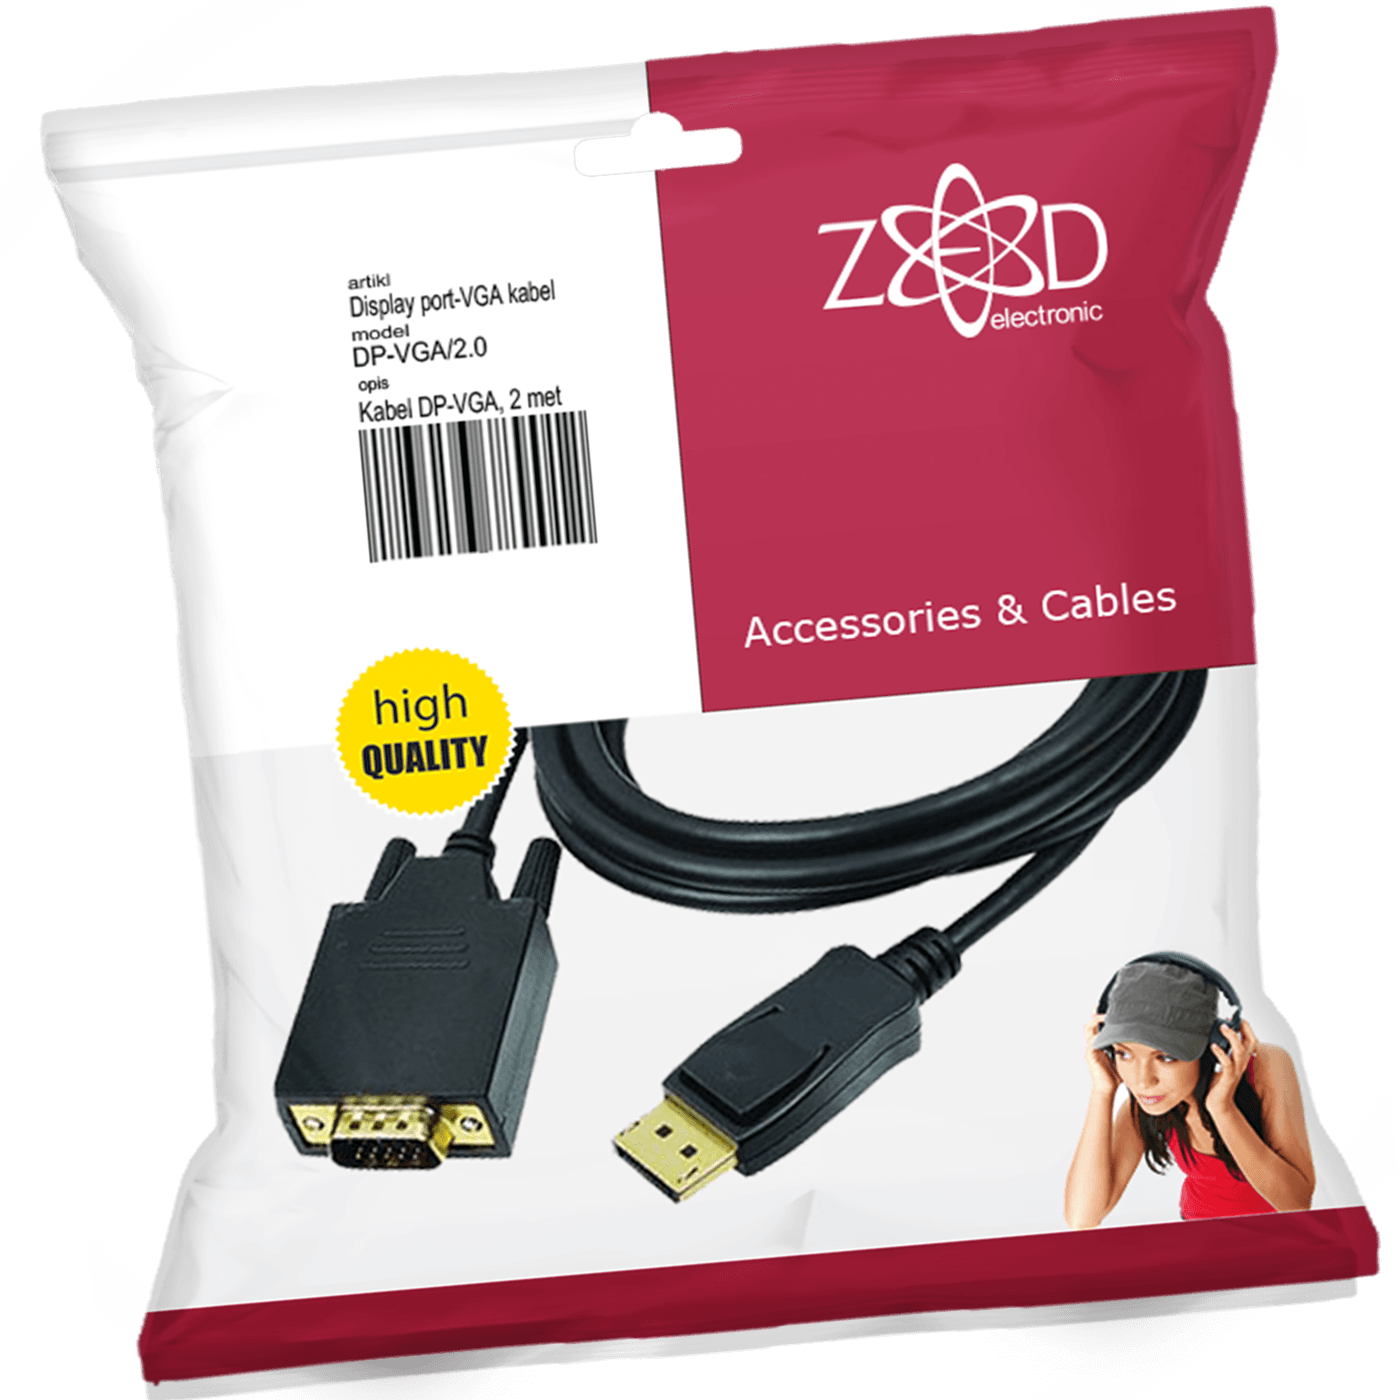 ZED electronic - DP-VGA/2.0